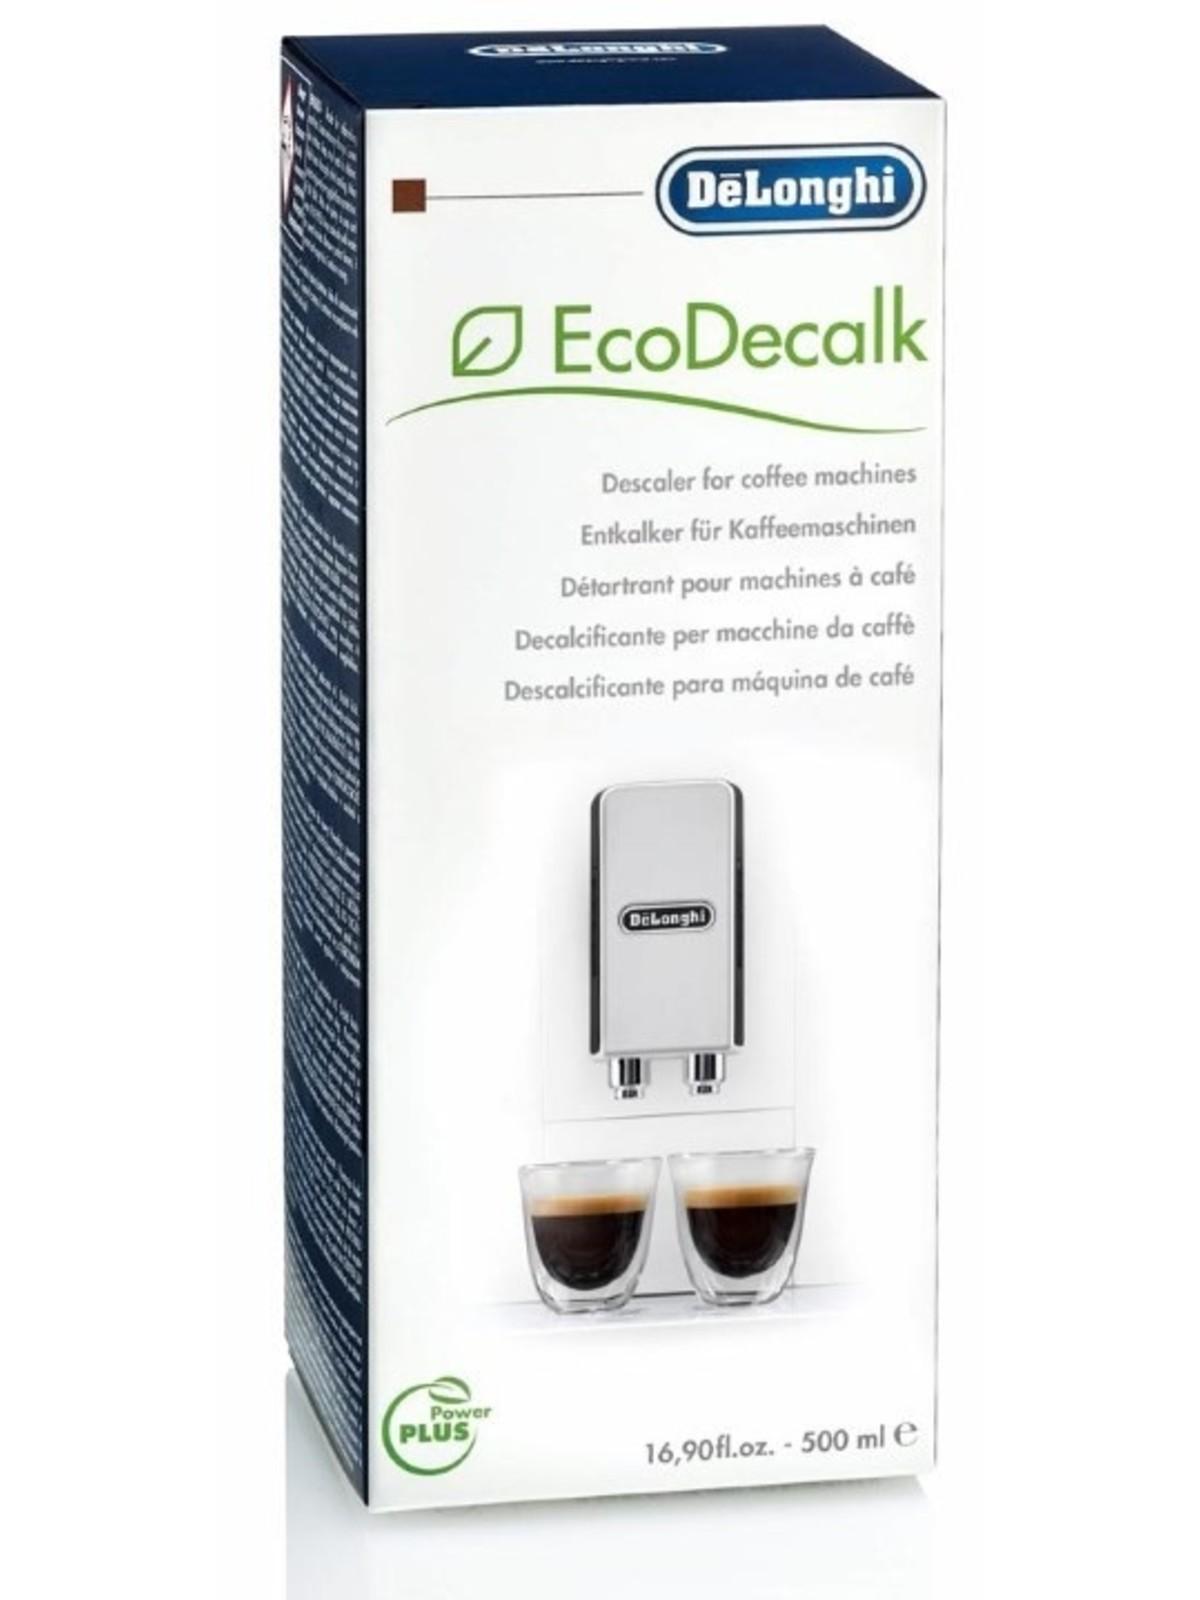 DELONGHI Espresso EcoDecalk, 500ml (5513296041)